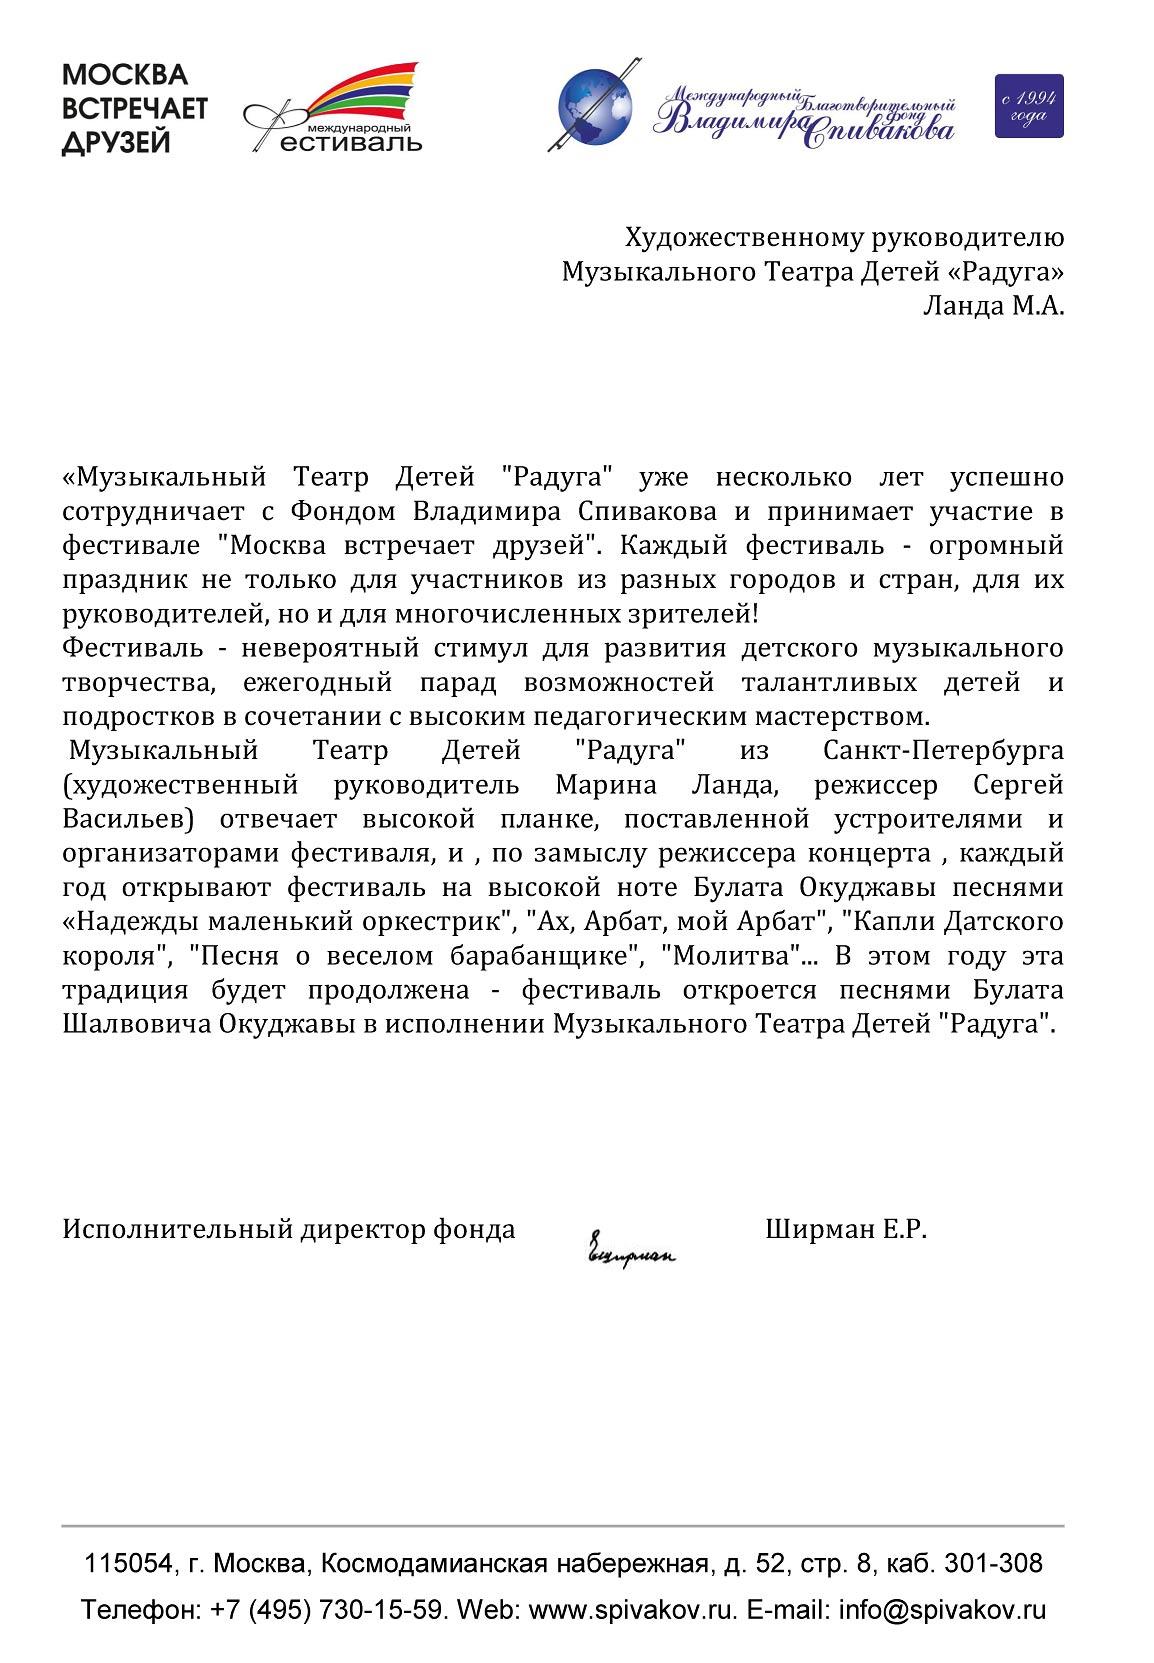 spivakov_pismo